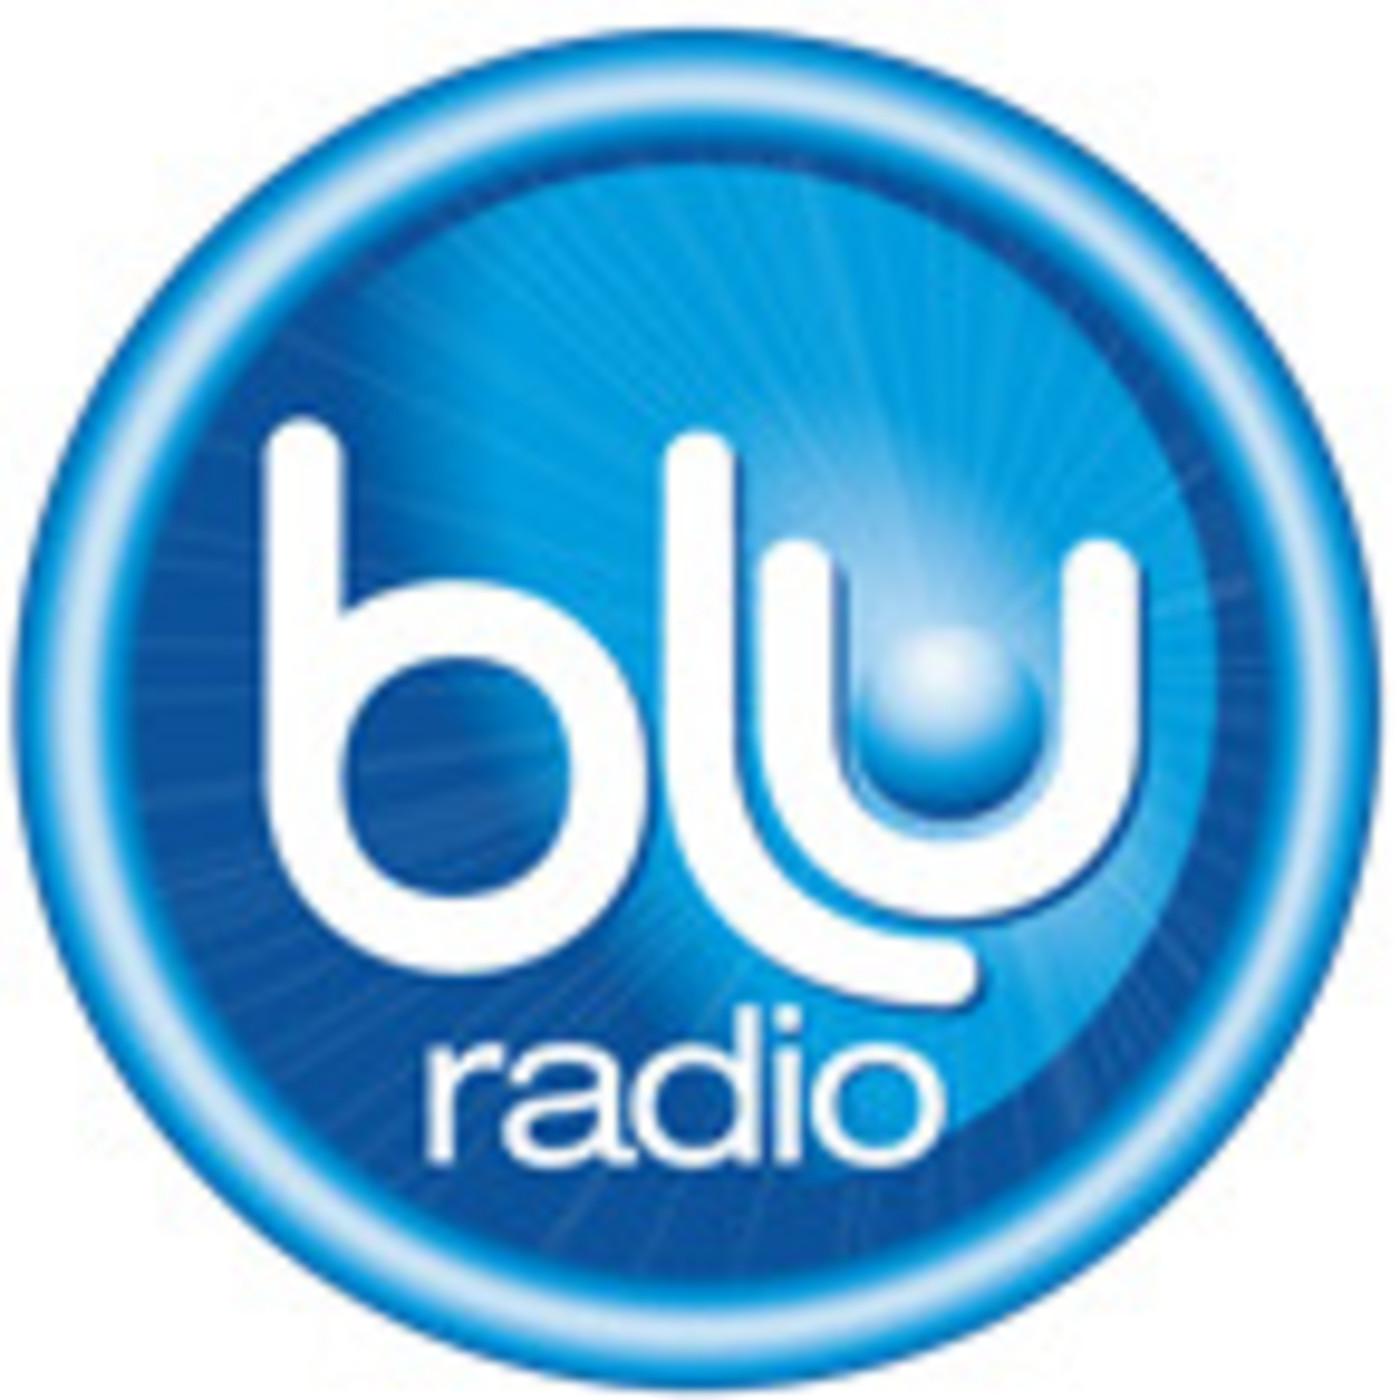 - BLU Radio